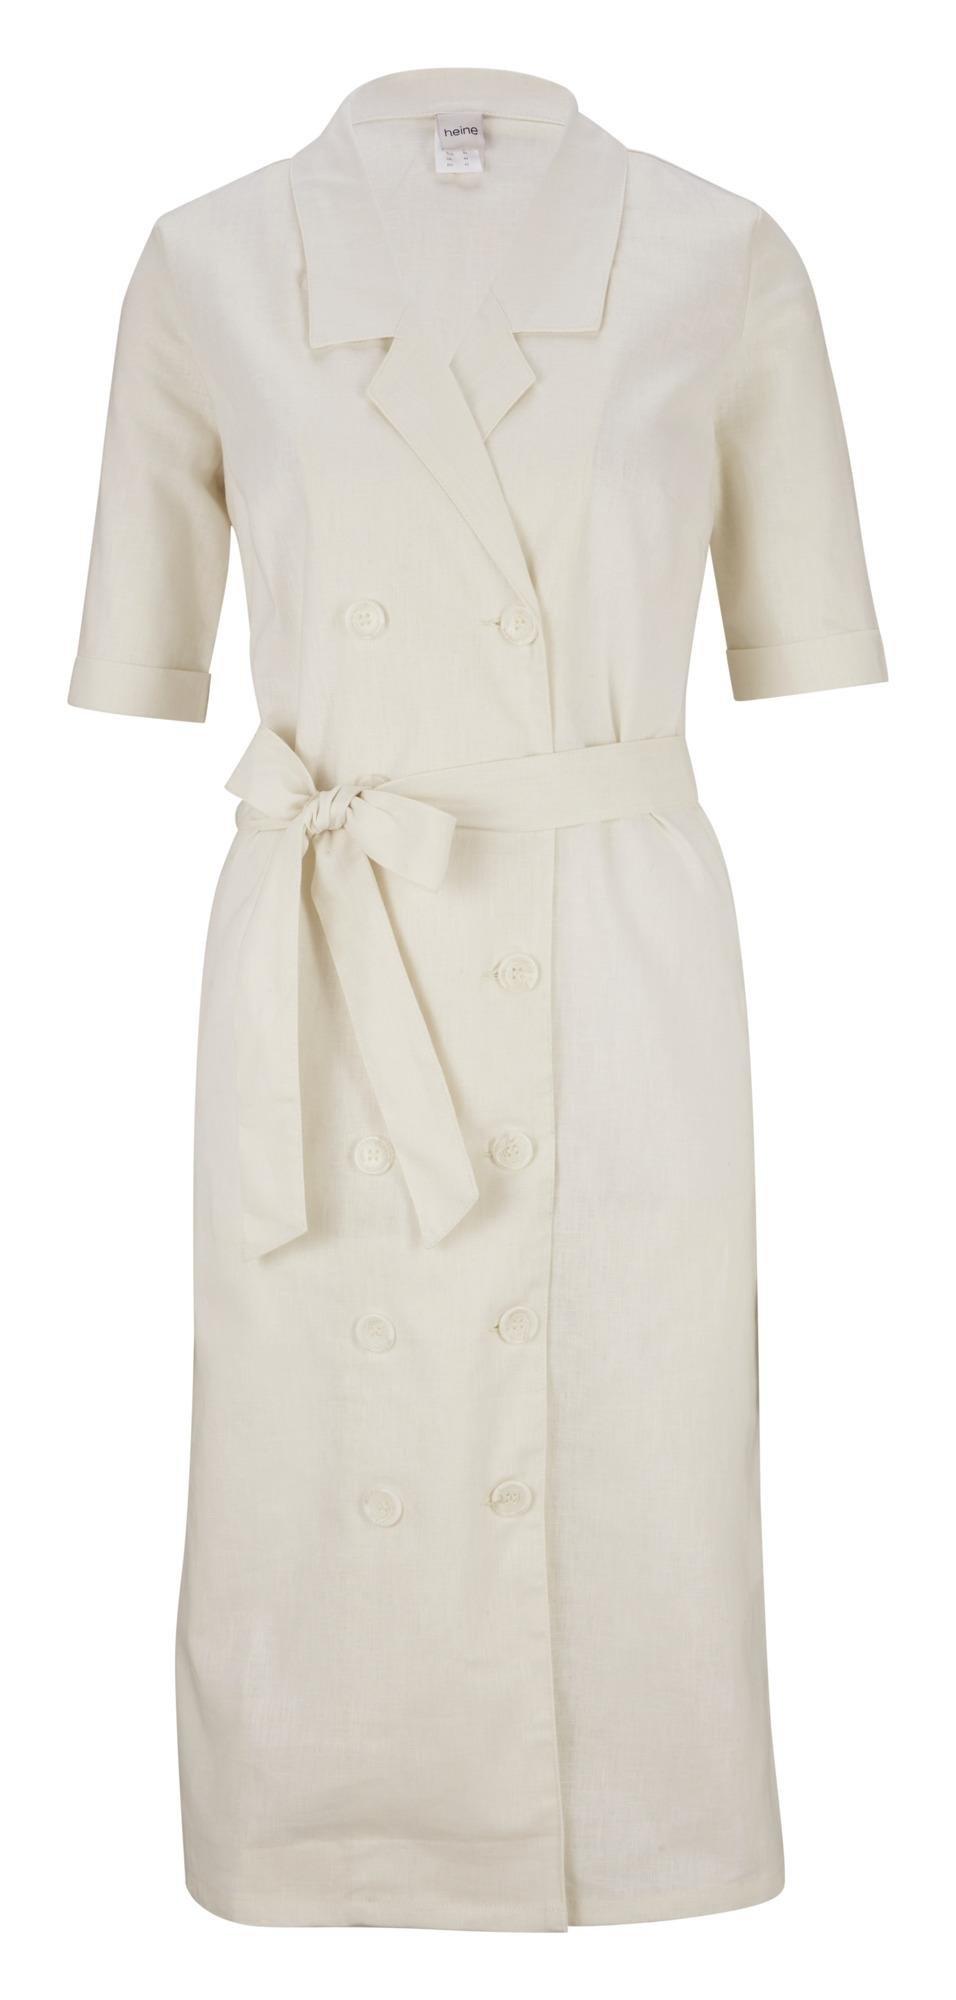 Wonderbaarlijk Linnen jurk nu online kopen | OTTO SE-31